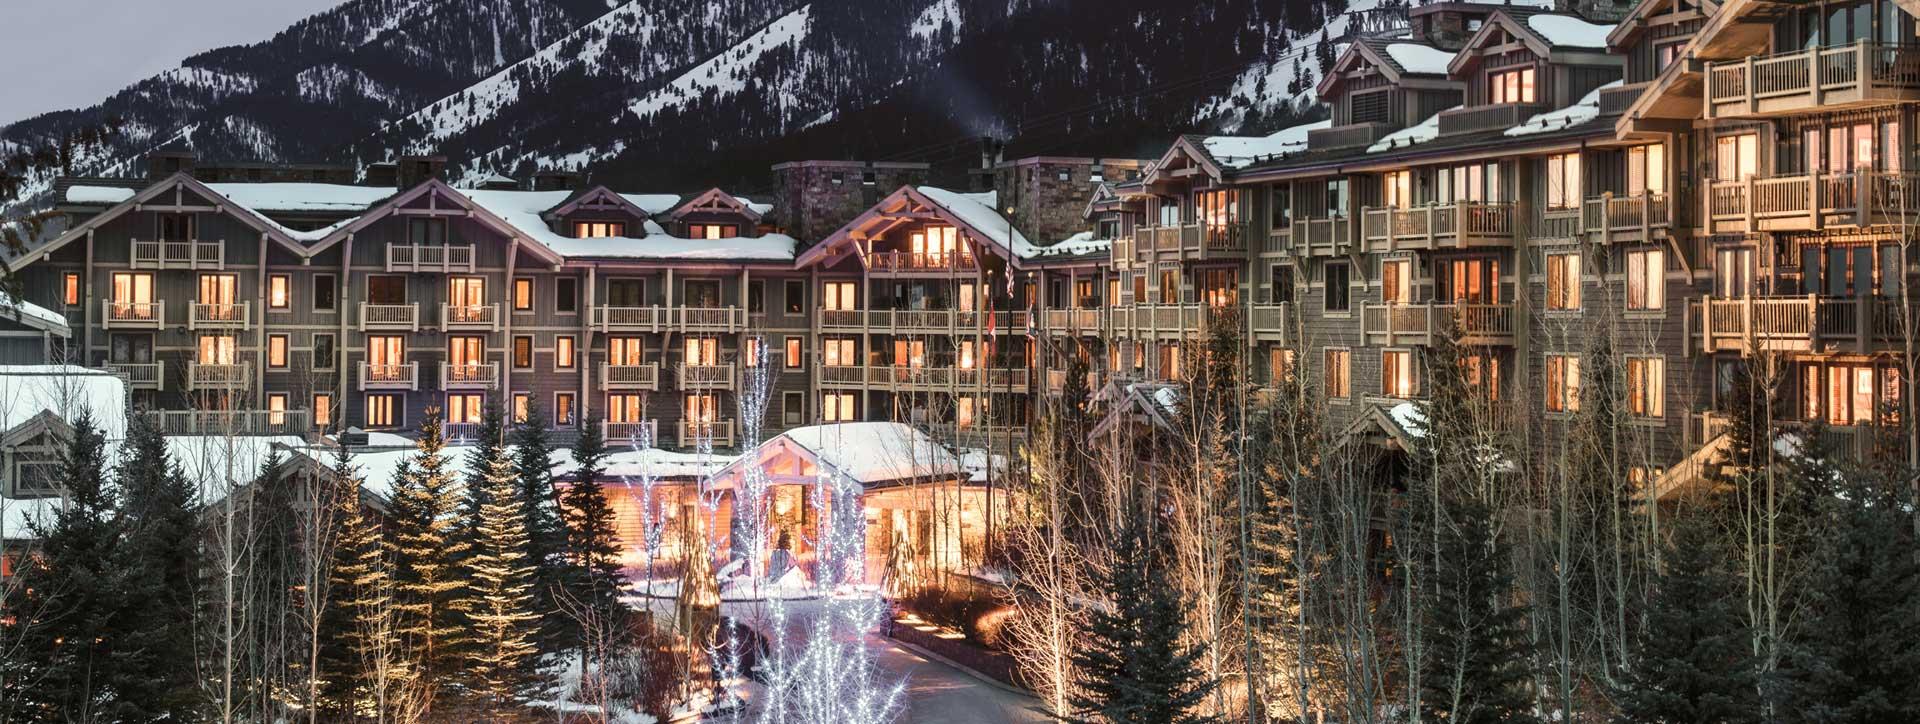 Four Seasons Resort Jackson Hole, GOLF's Top 100 Resorts